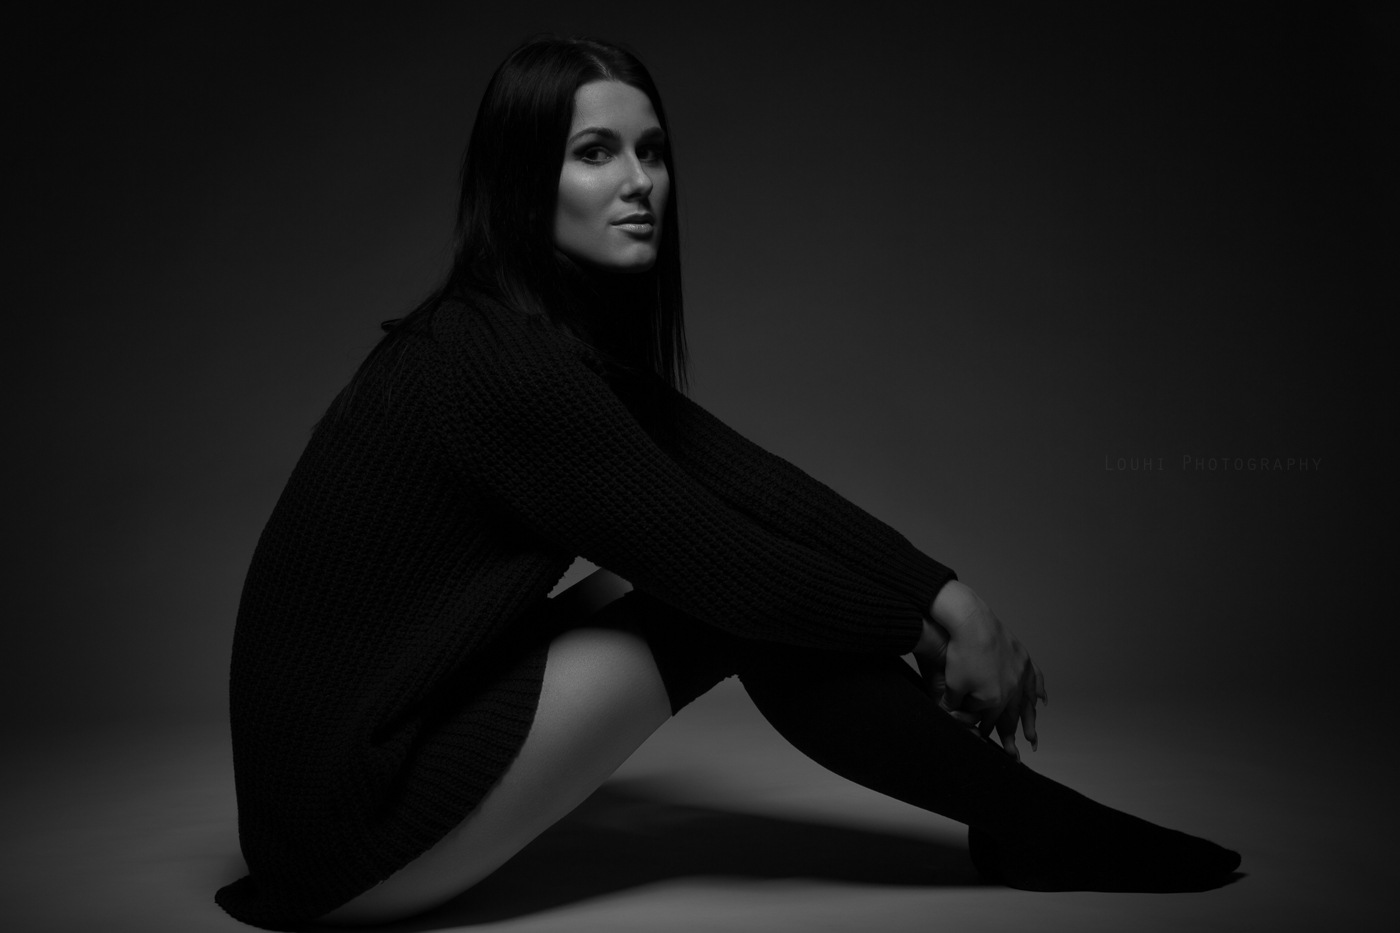 Minja #2 by Louhi Photography